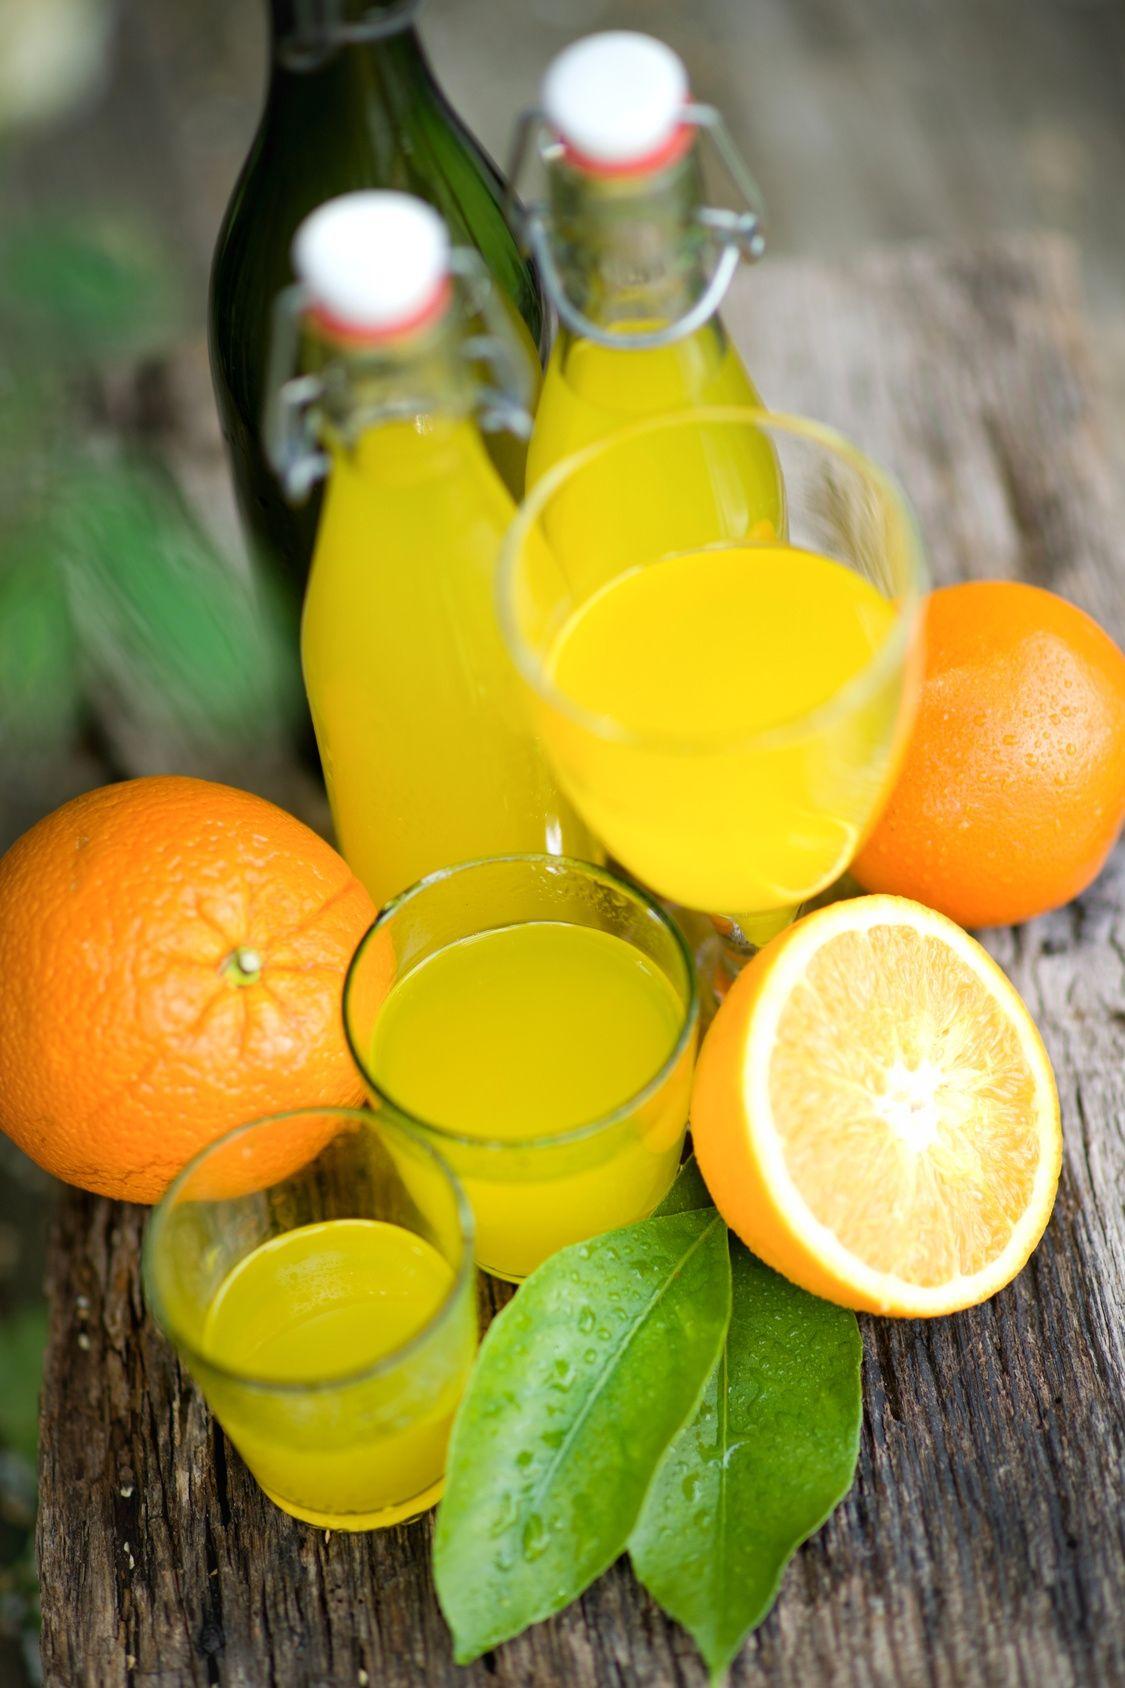 orangen zitronen limonade selber machen rezept diabetic diet pinterest. Black Bedroom Furniture Sets. Home Design Ideas